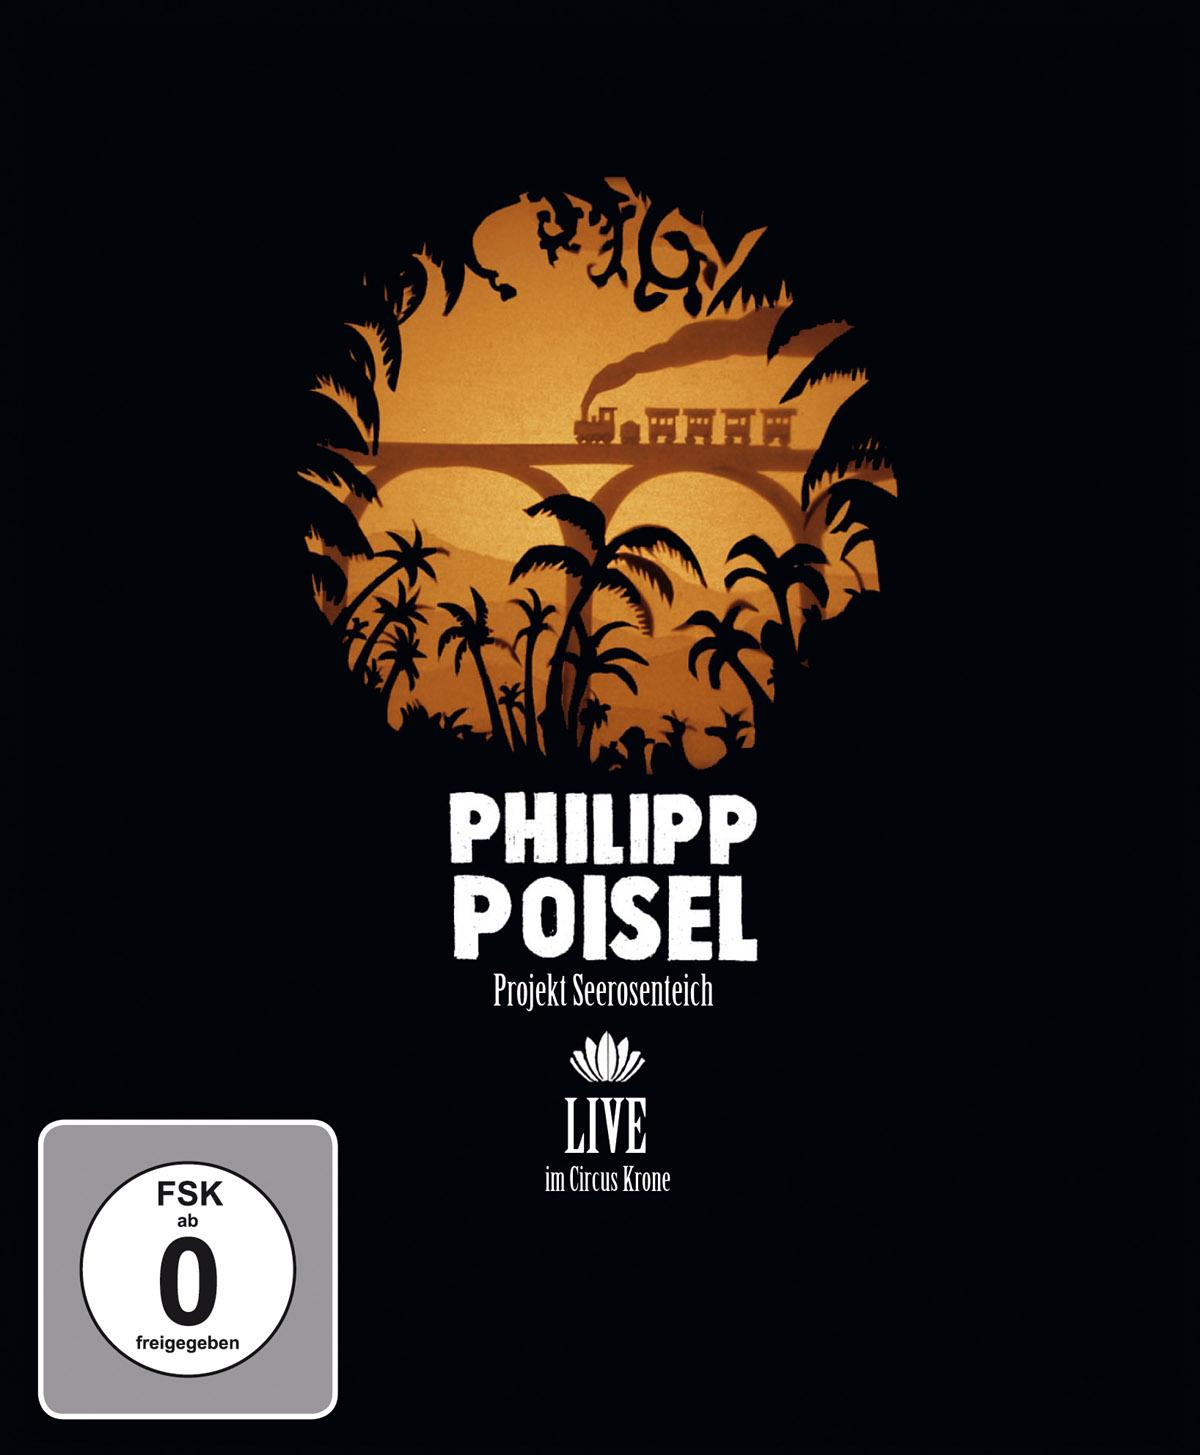 Philipp Poisel_Projekt_Seerosenteich